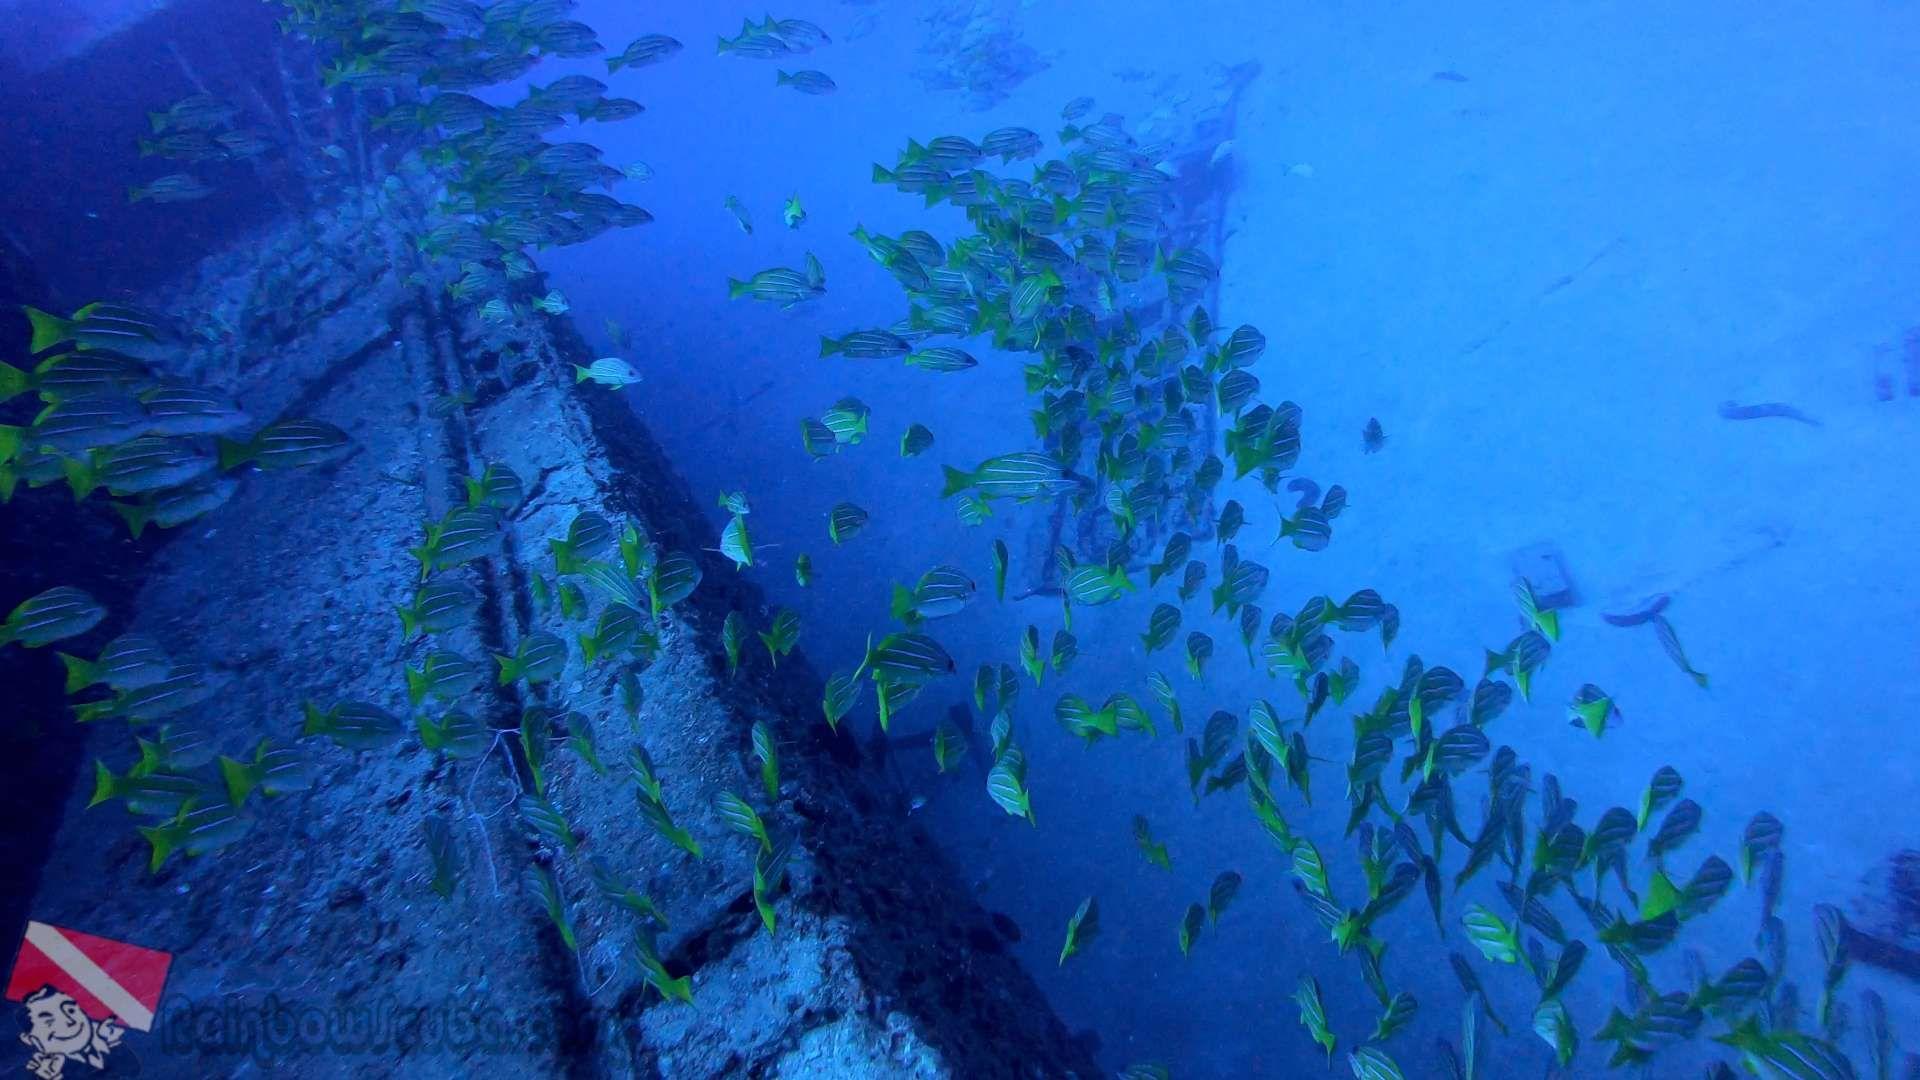 PADI certification course Scuba diving lessons, Padi